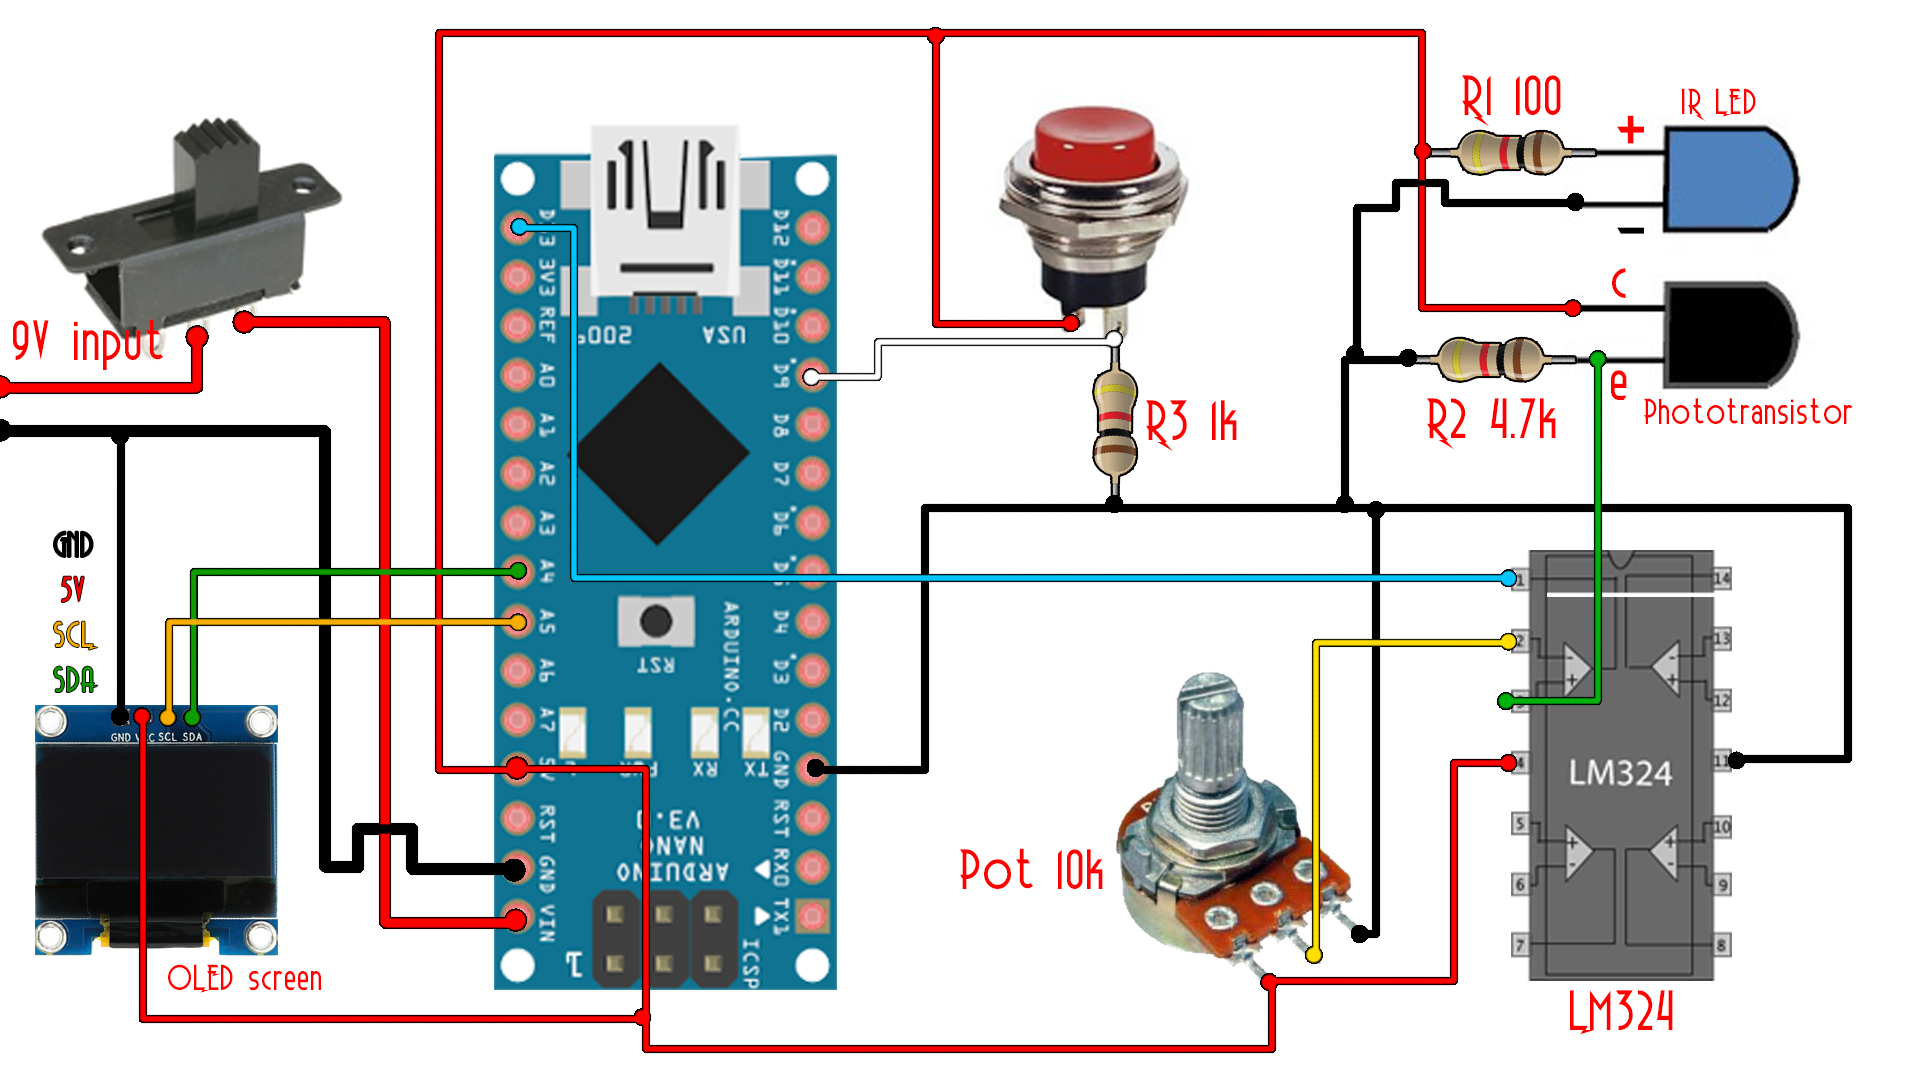 Rpm Indicator Circuit Diagram And Schematics Analog Phase Detector Measuringandtestcircuit Arduino Tachometer Ir Sensor Meter Printed